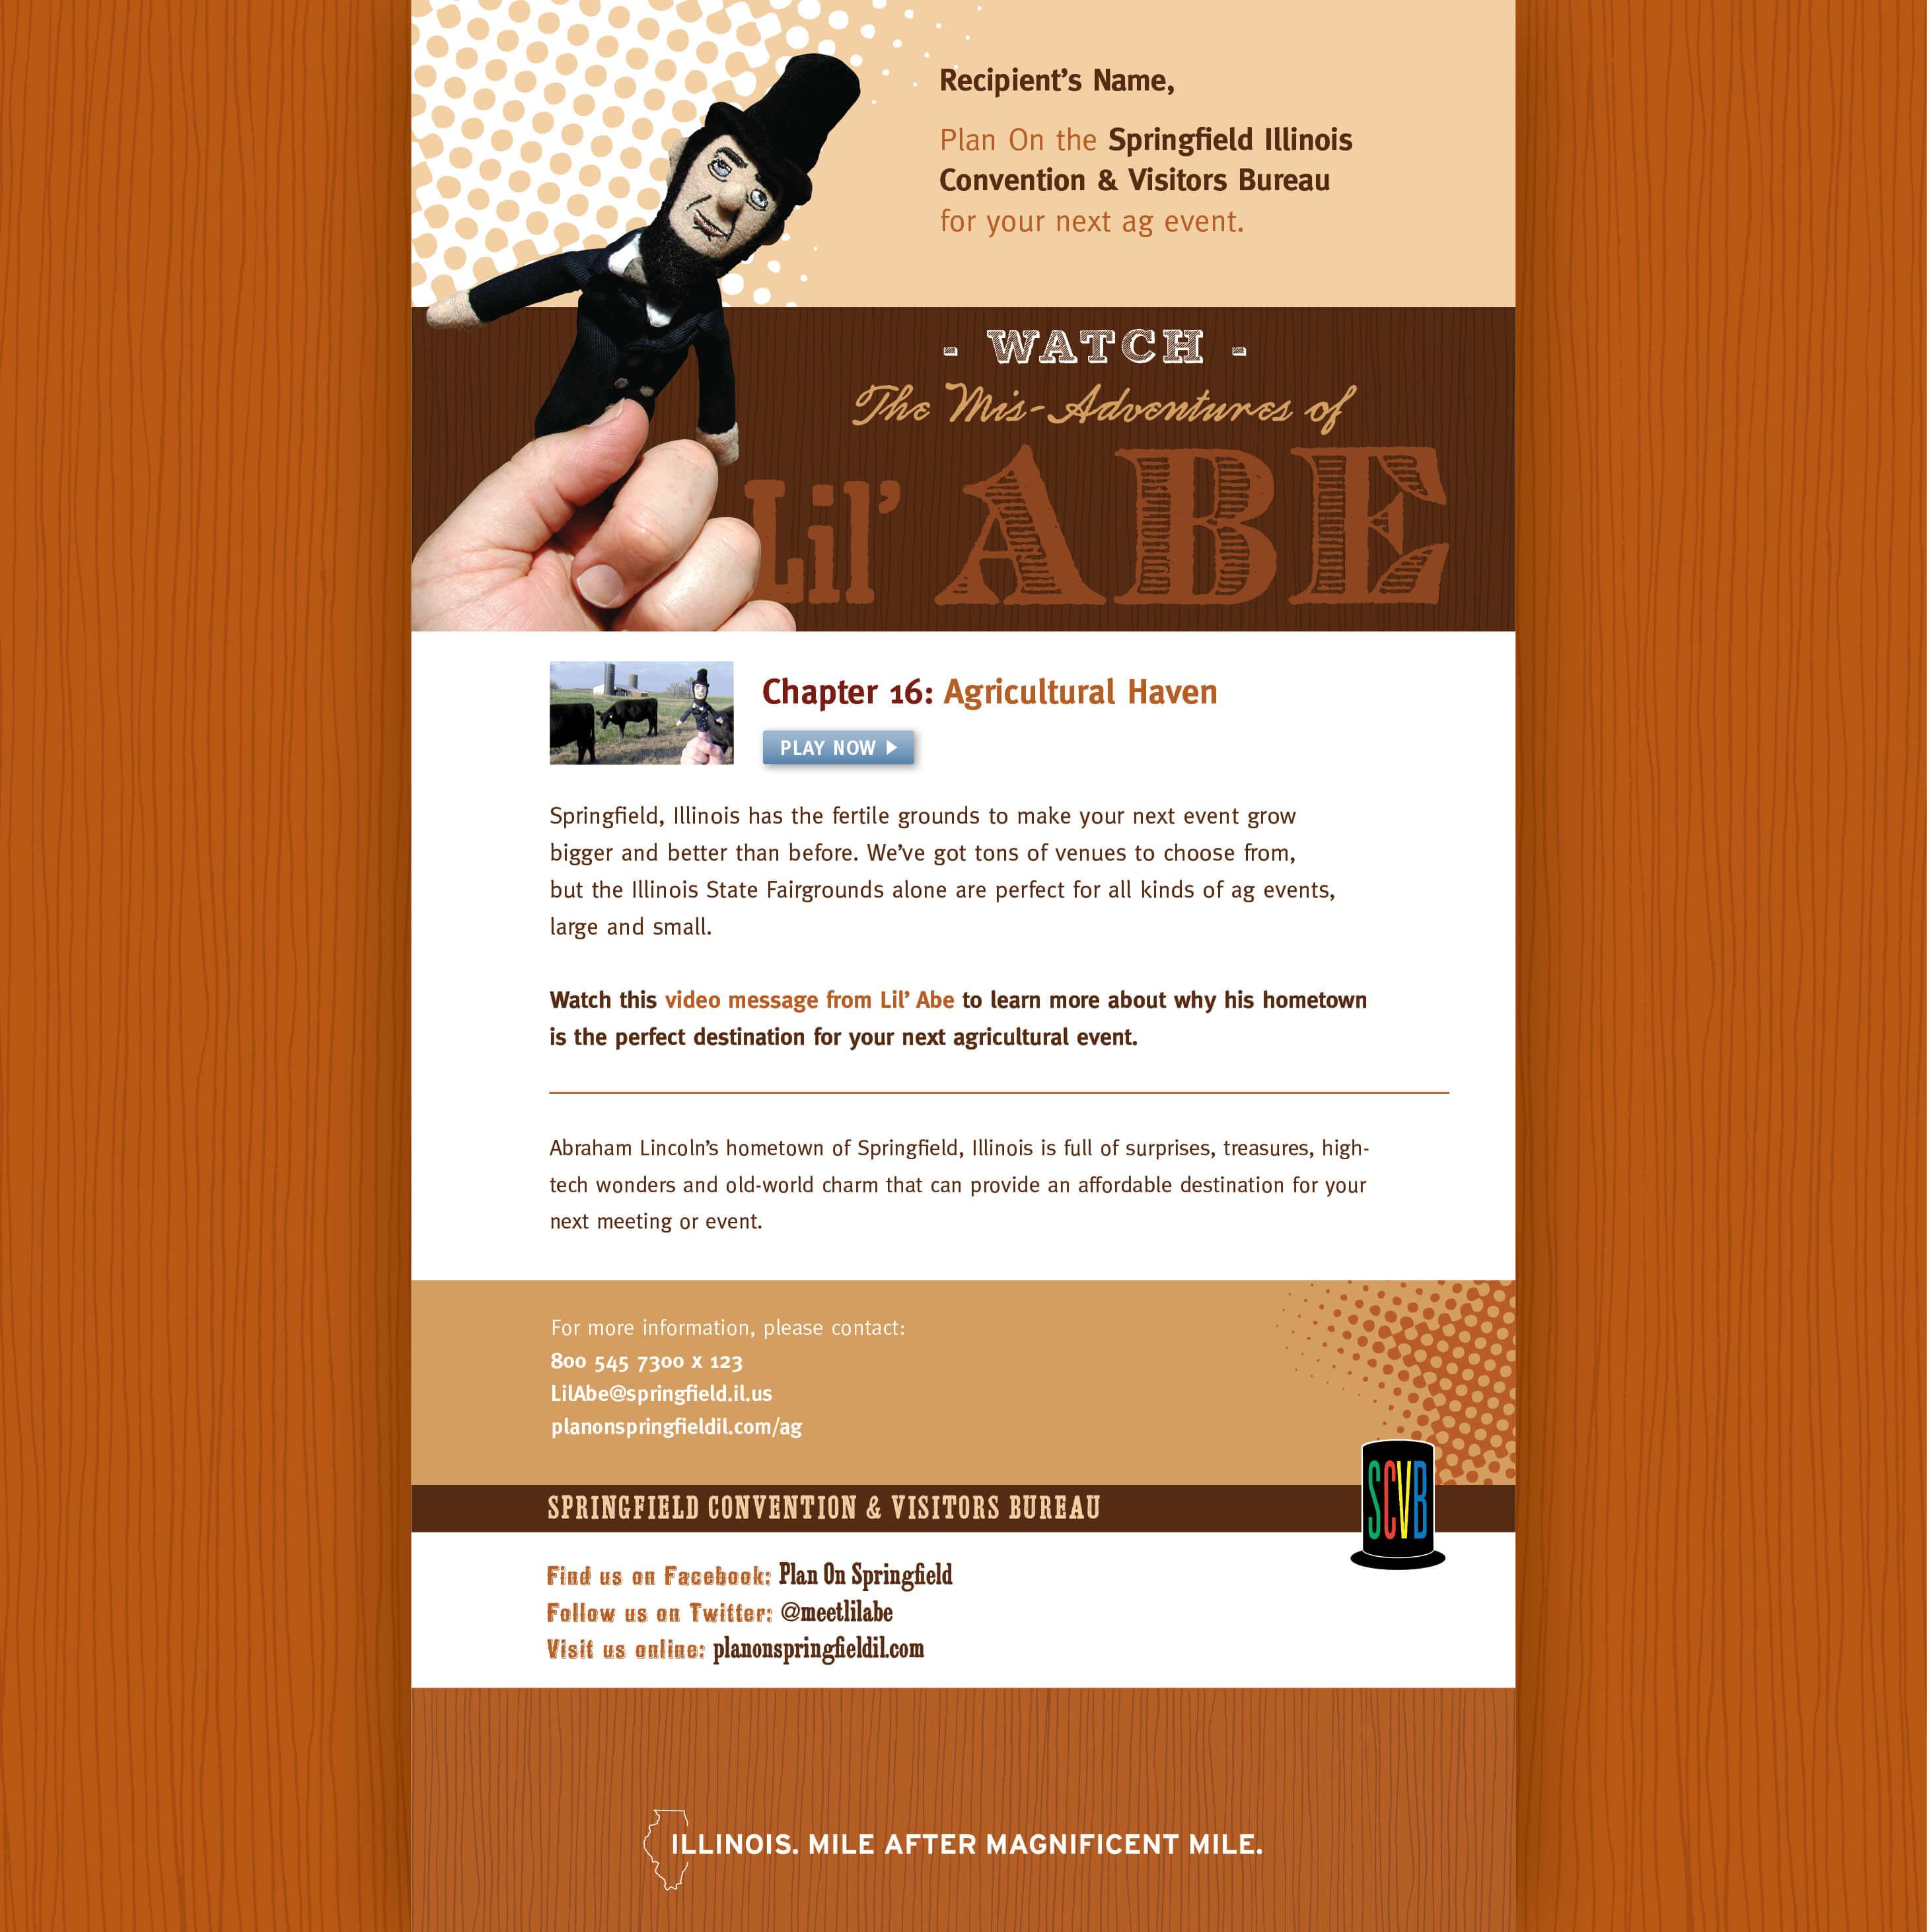 Springfield Convention & Visitors Bureau | Lil' Abe Marketing Campaign